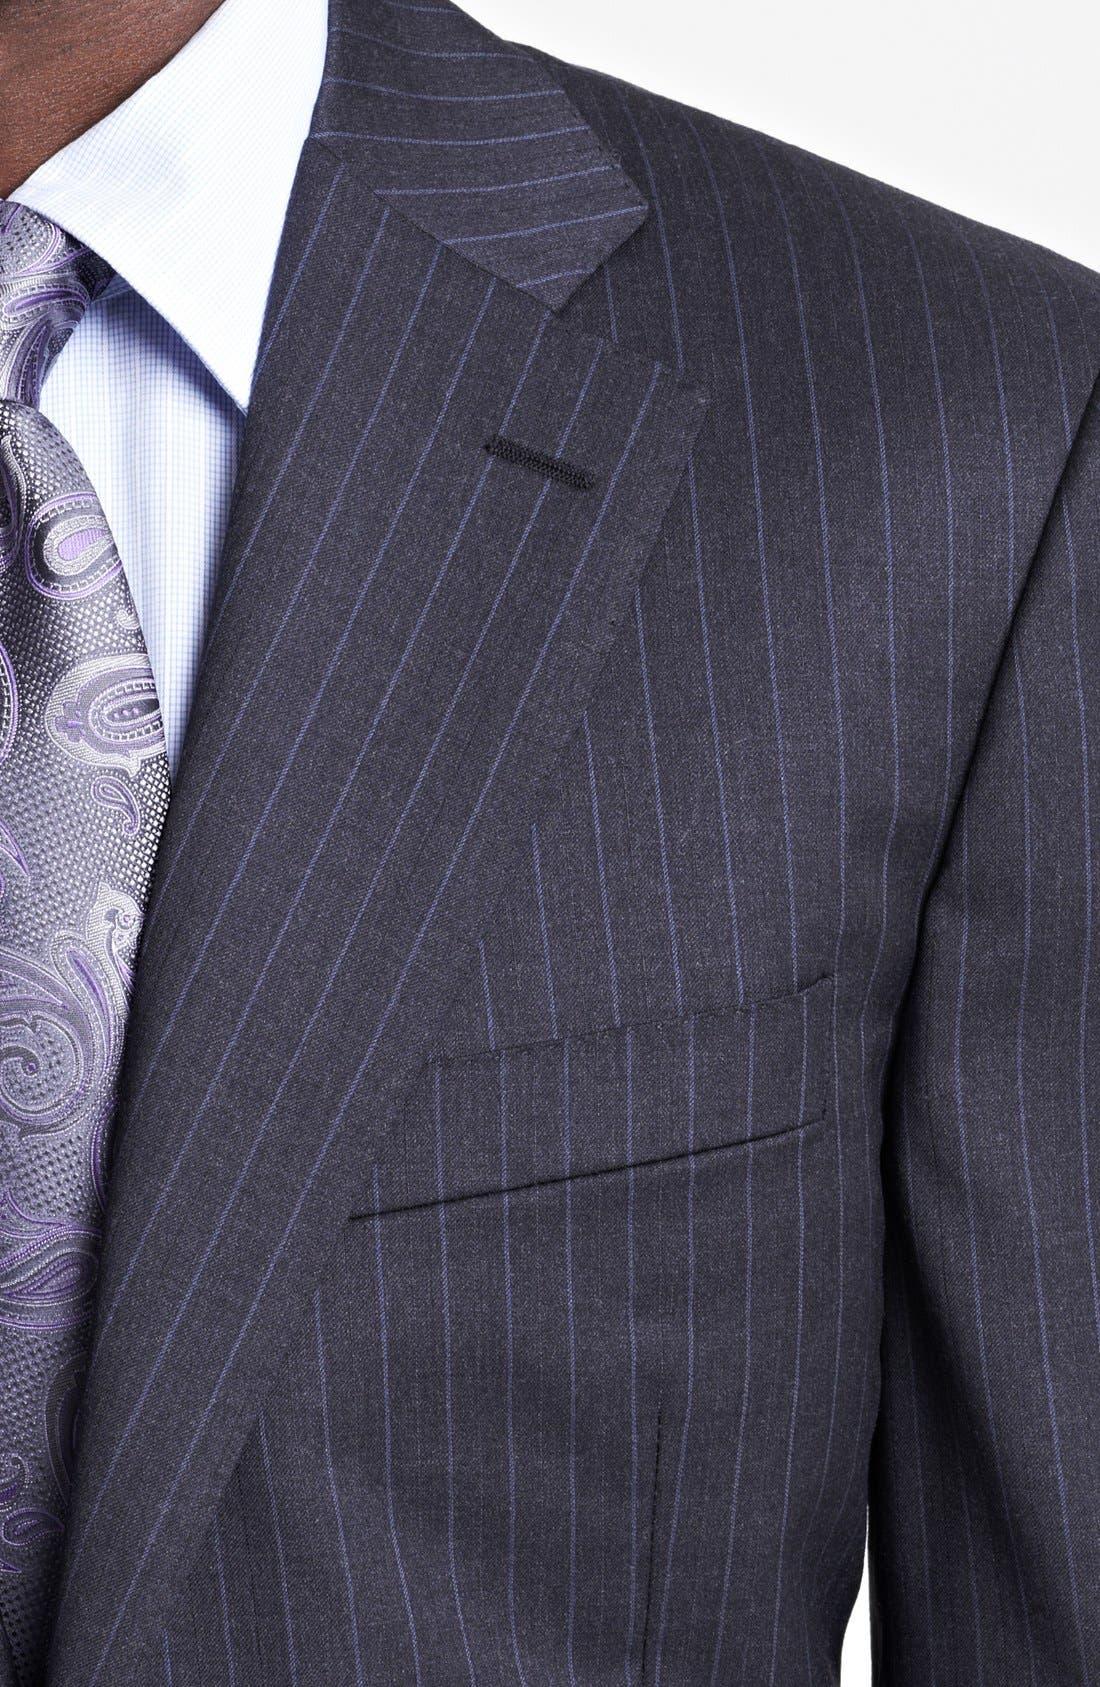 Alternate Image 2  - Canali Classic Fit Stripe Suit